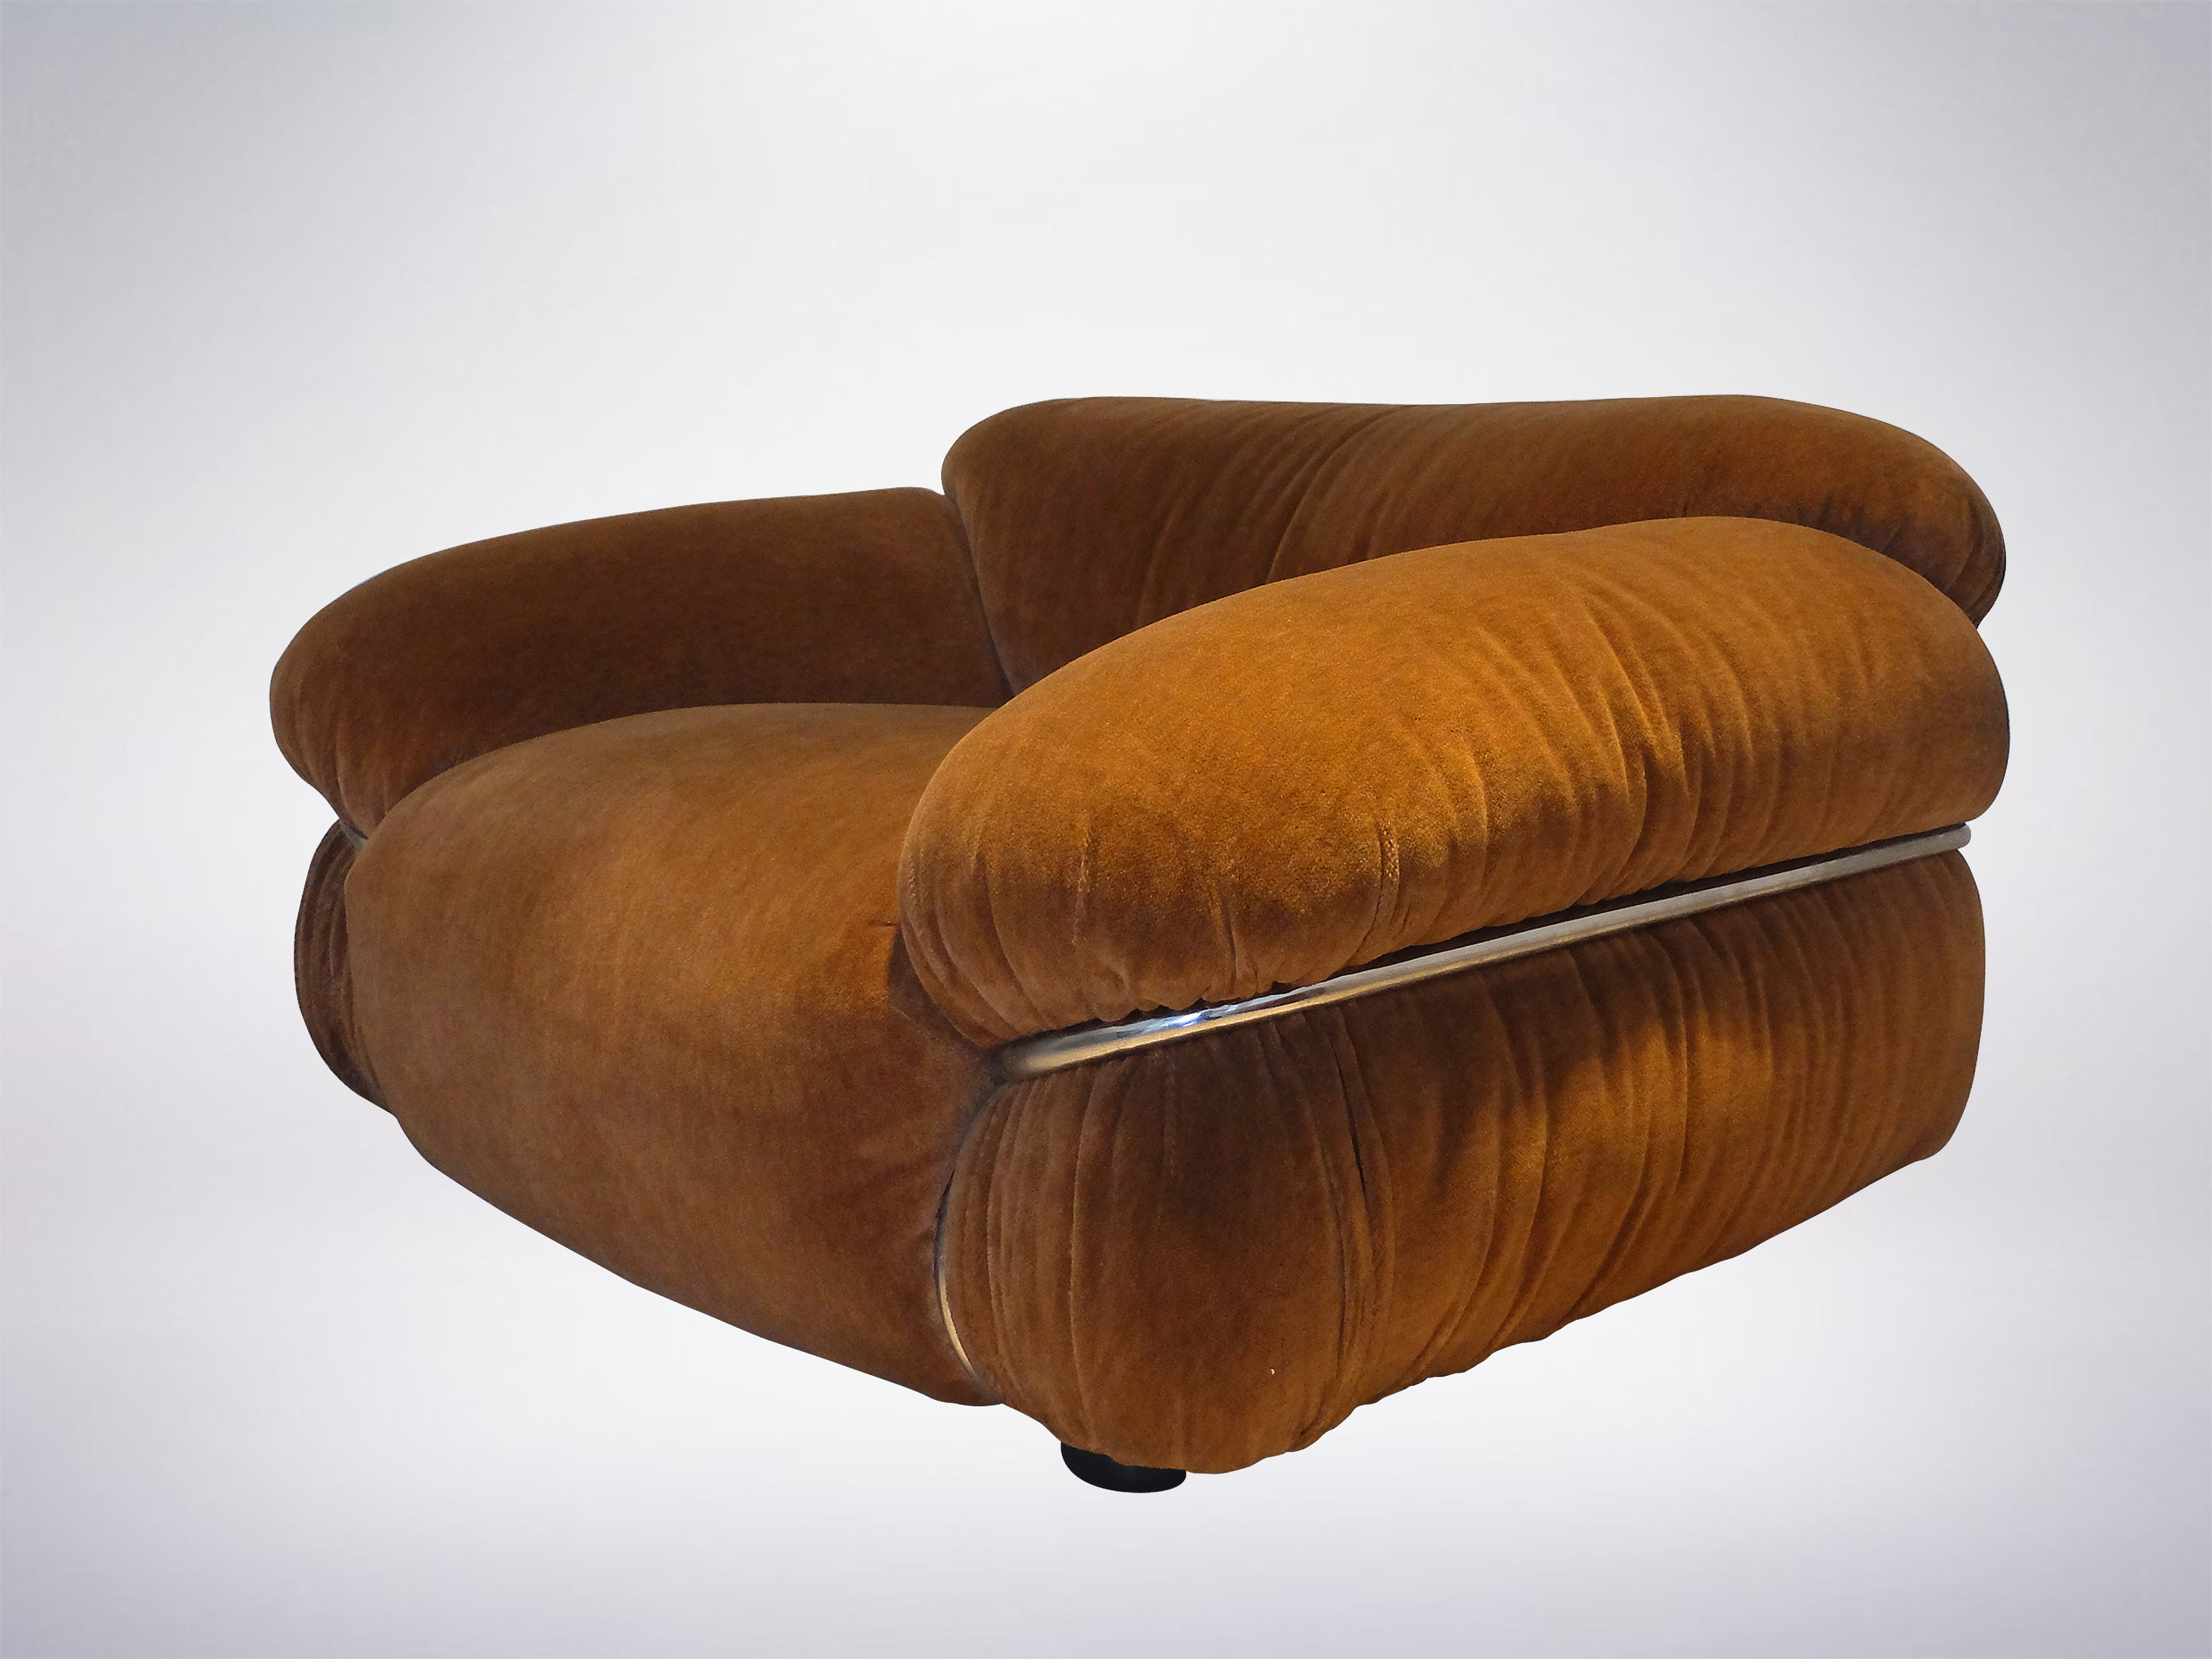 Sesann Armchair By Gianfranco Frattini For Cassina For Sale At